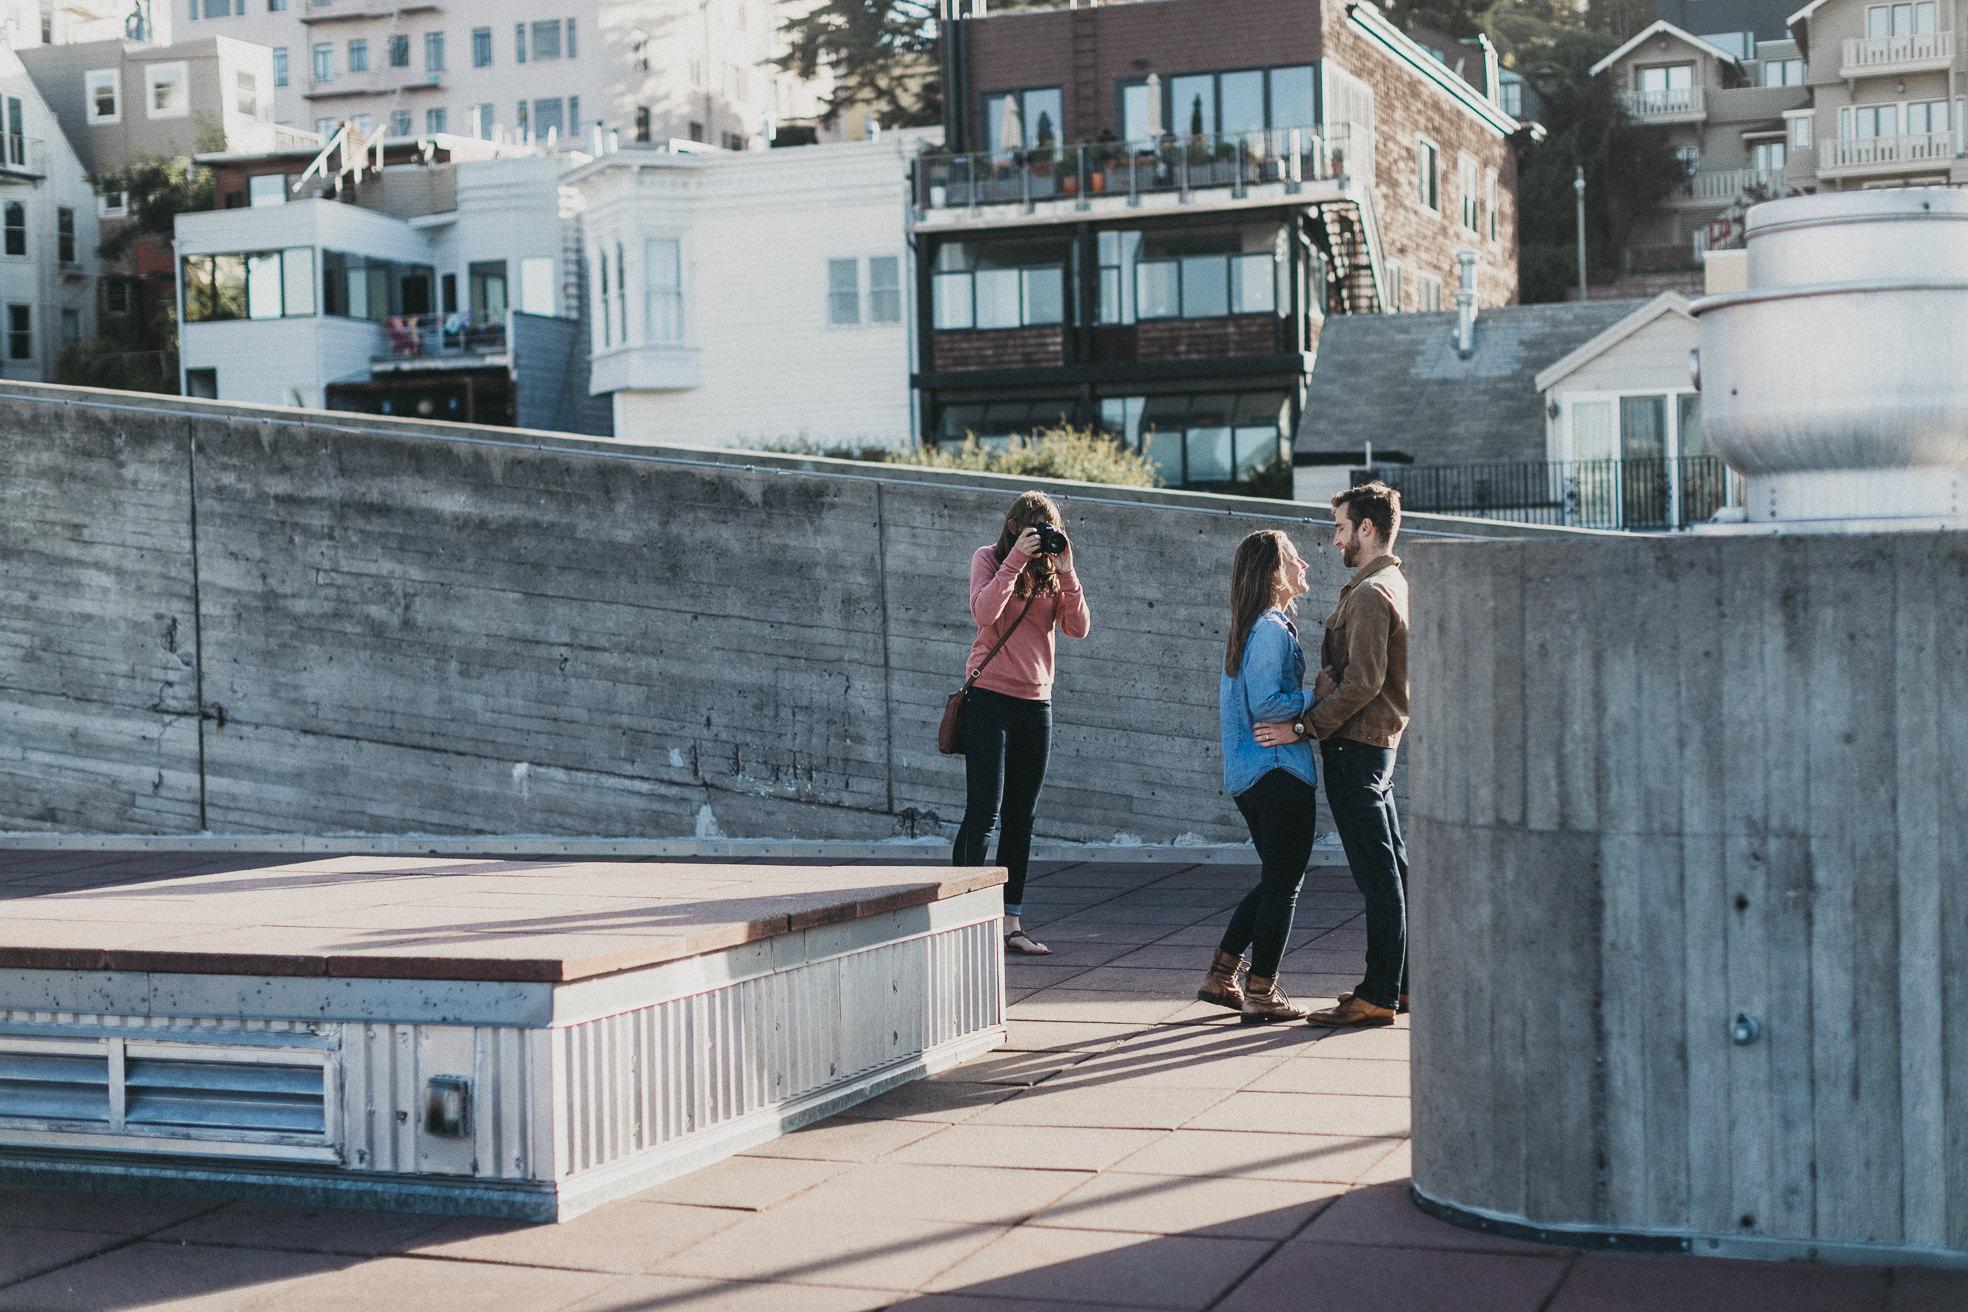 San-Francisco-BildervomLeben-8778